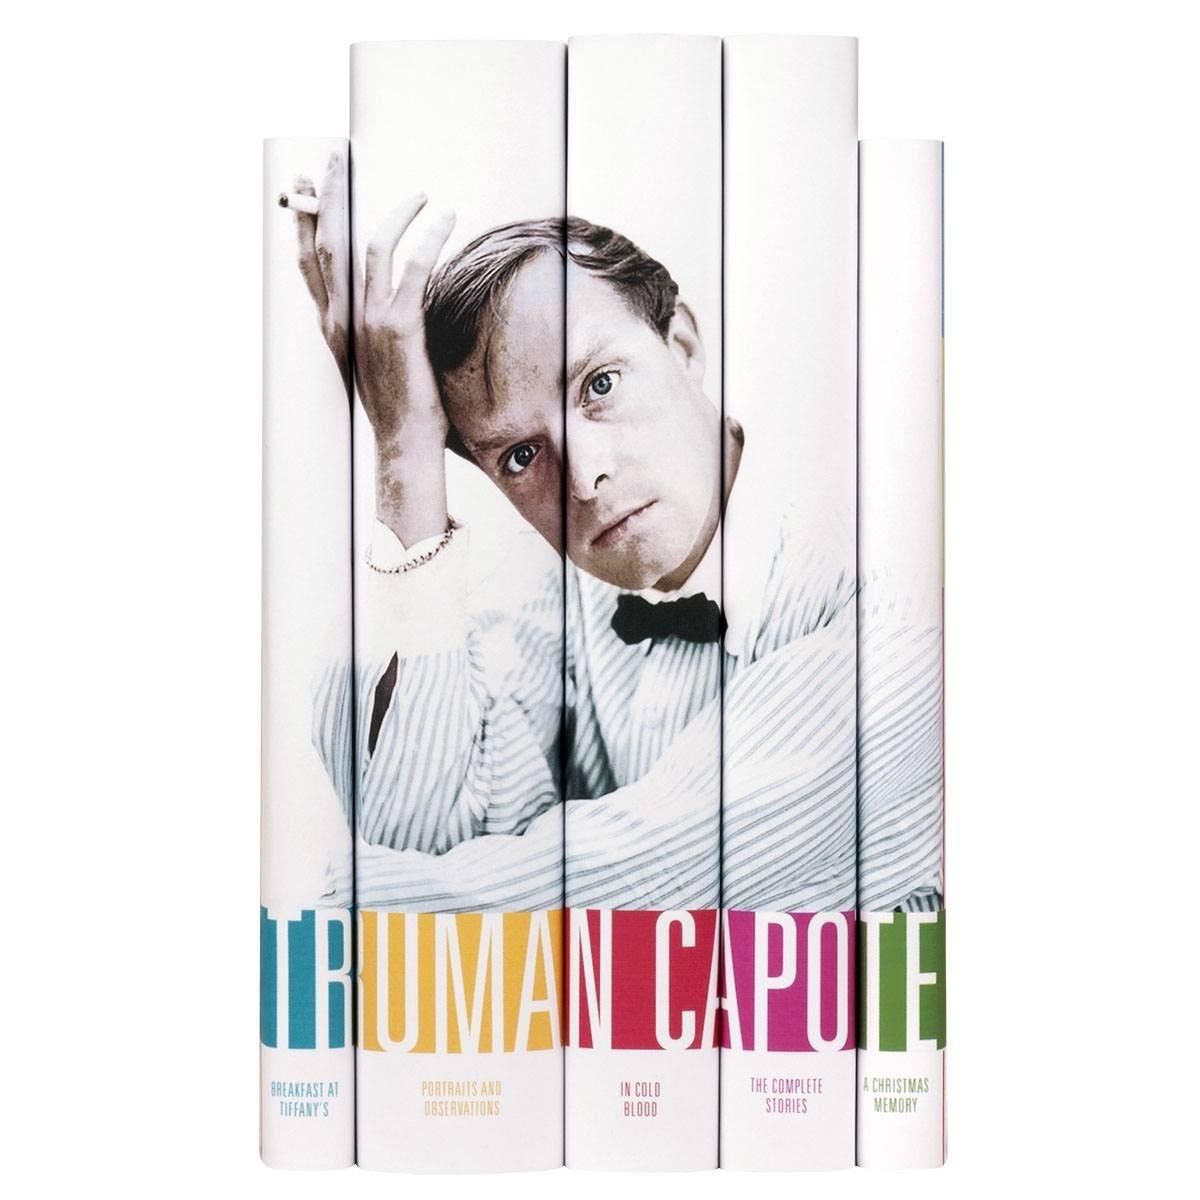 Truman Capote Set, aproximadamente € 128, Juniper Books